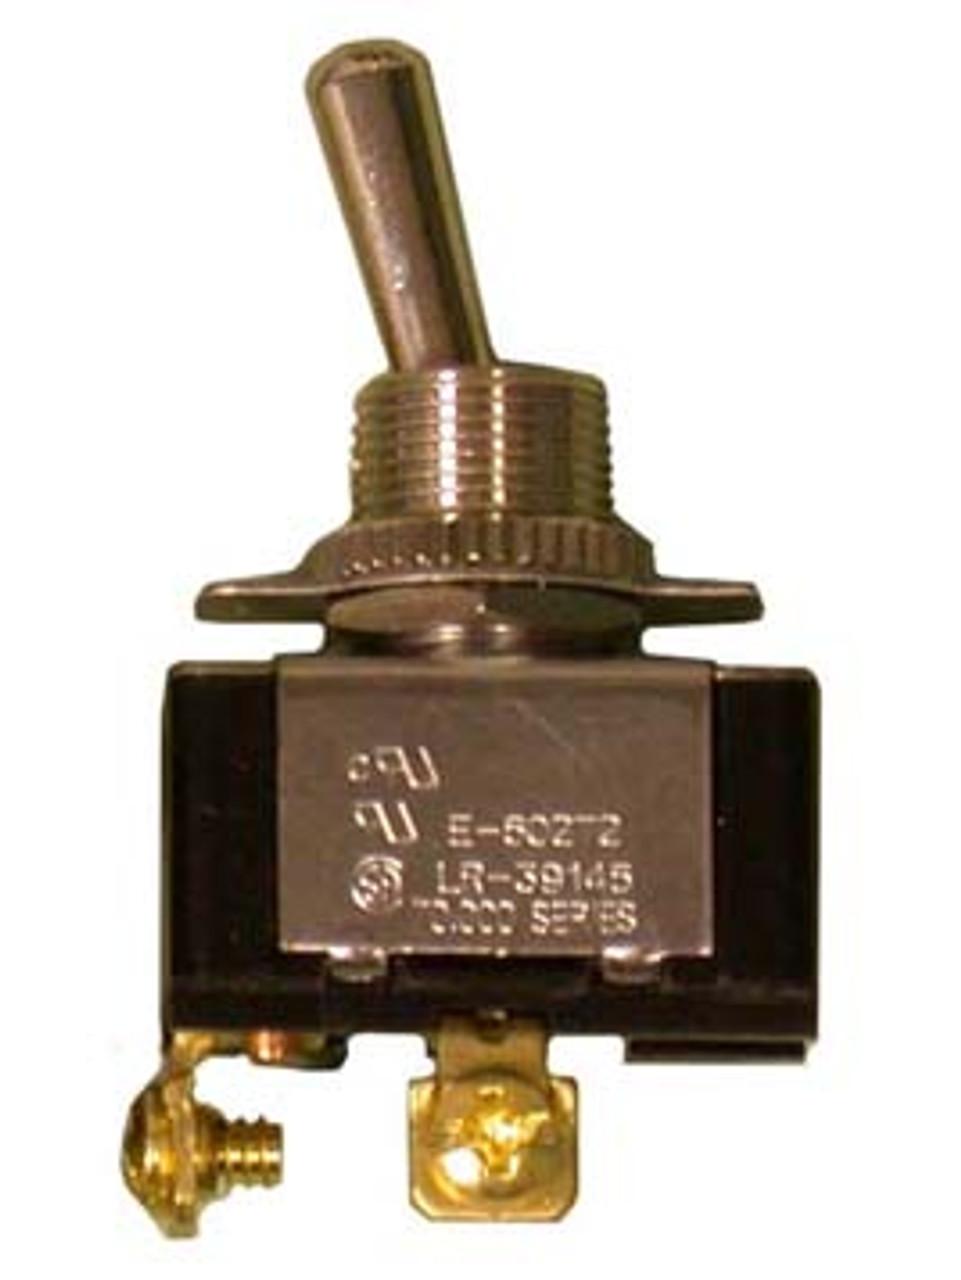 571 --- Medium Duty Toggle Switch